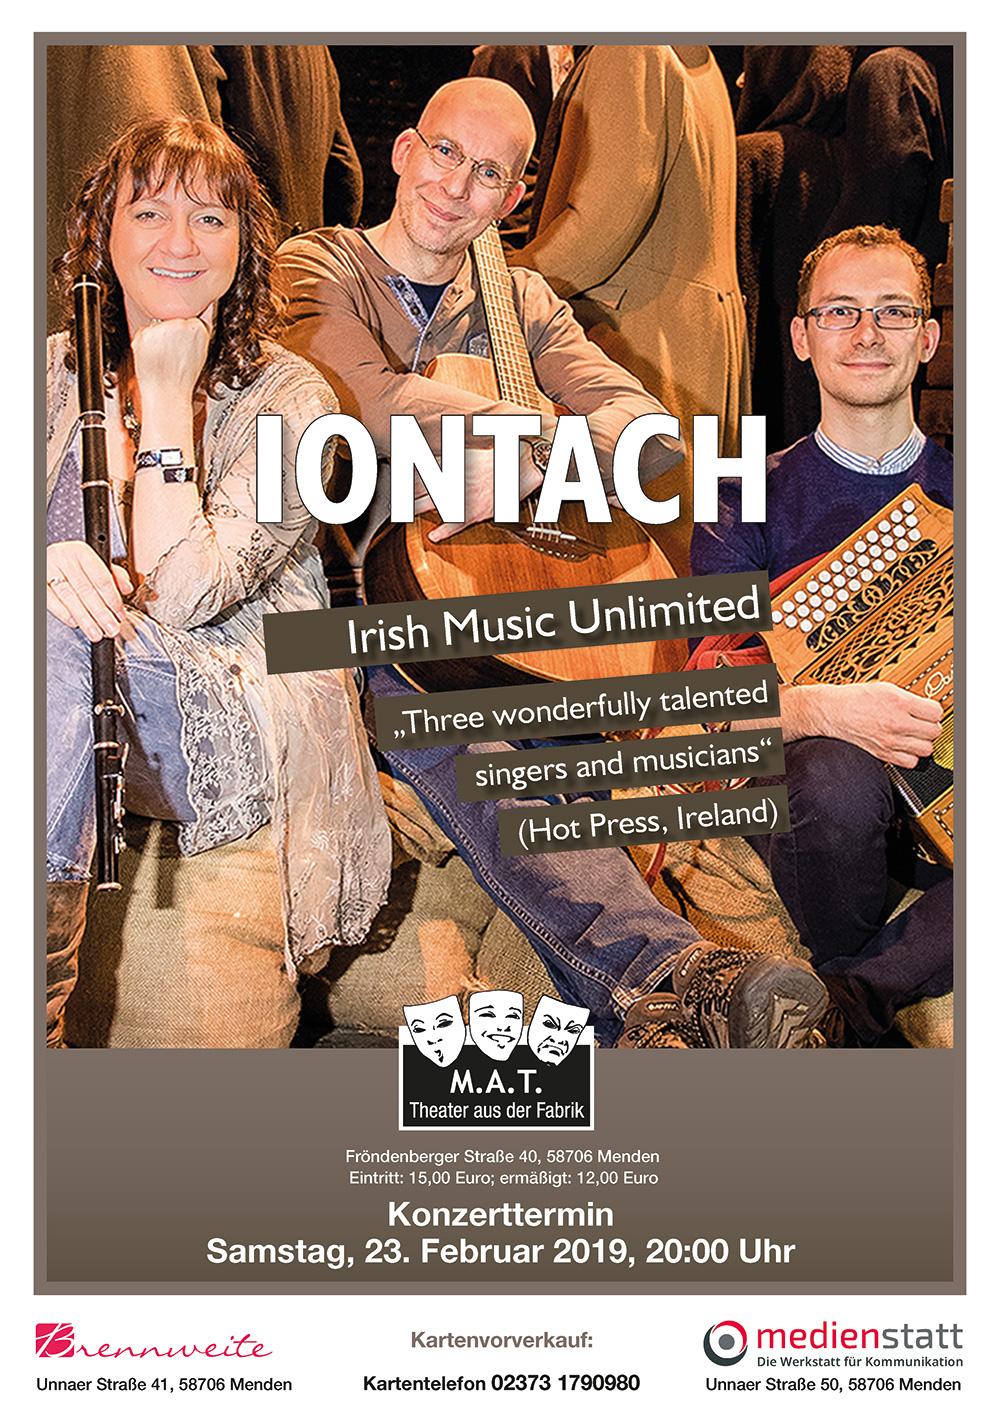 IONTACH